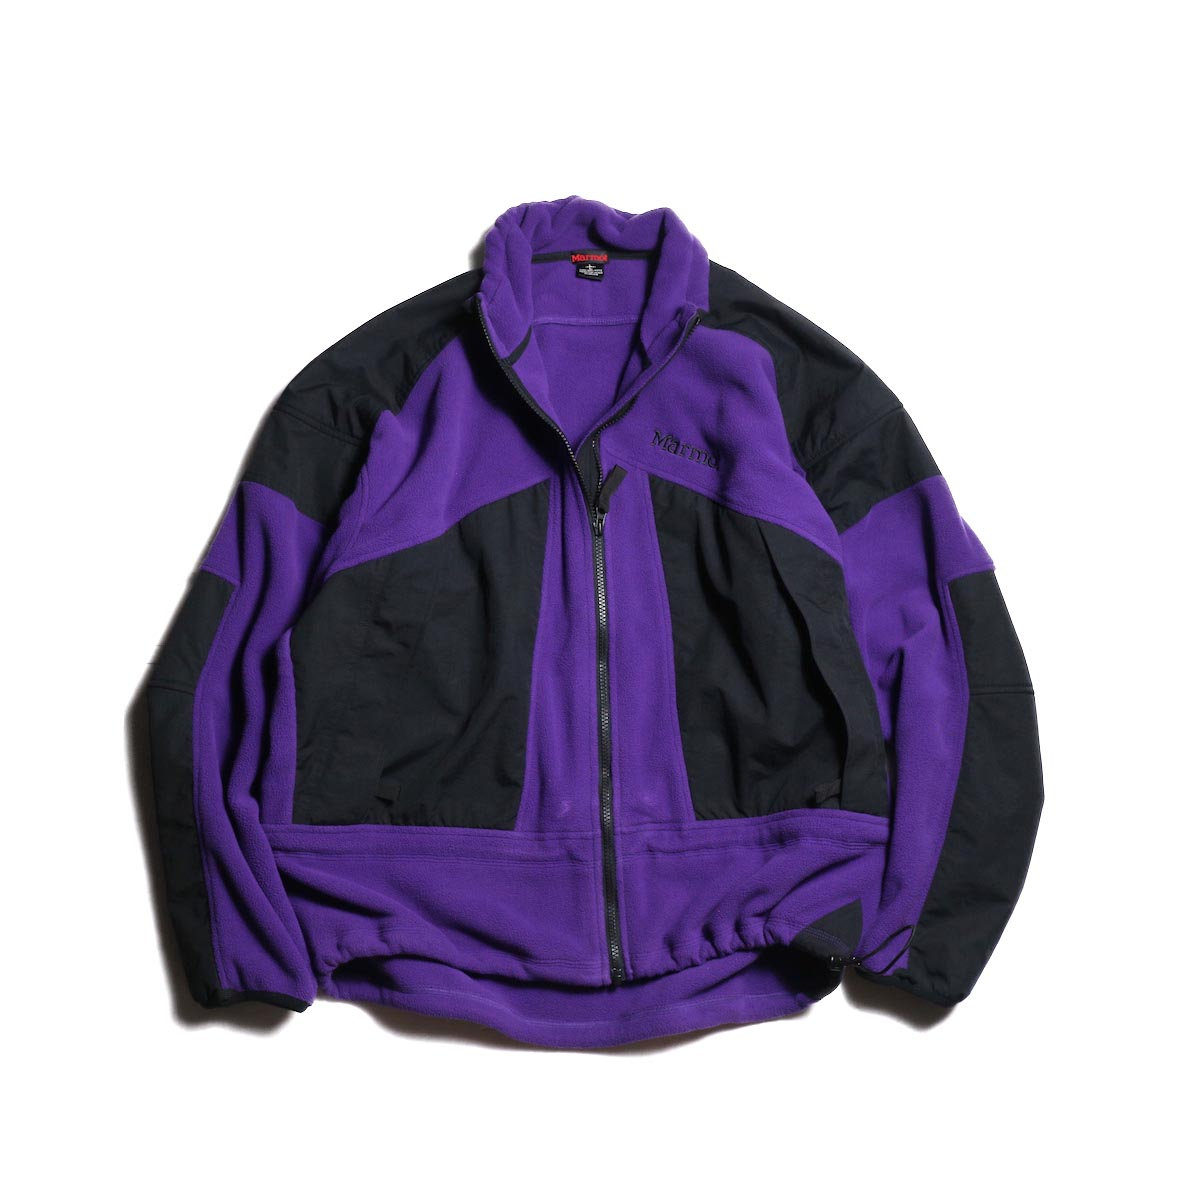 Marmot Histric Collection / Alpinist Tech Sweater (Purple×Black)